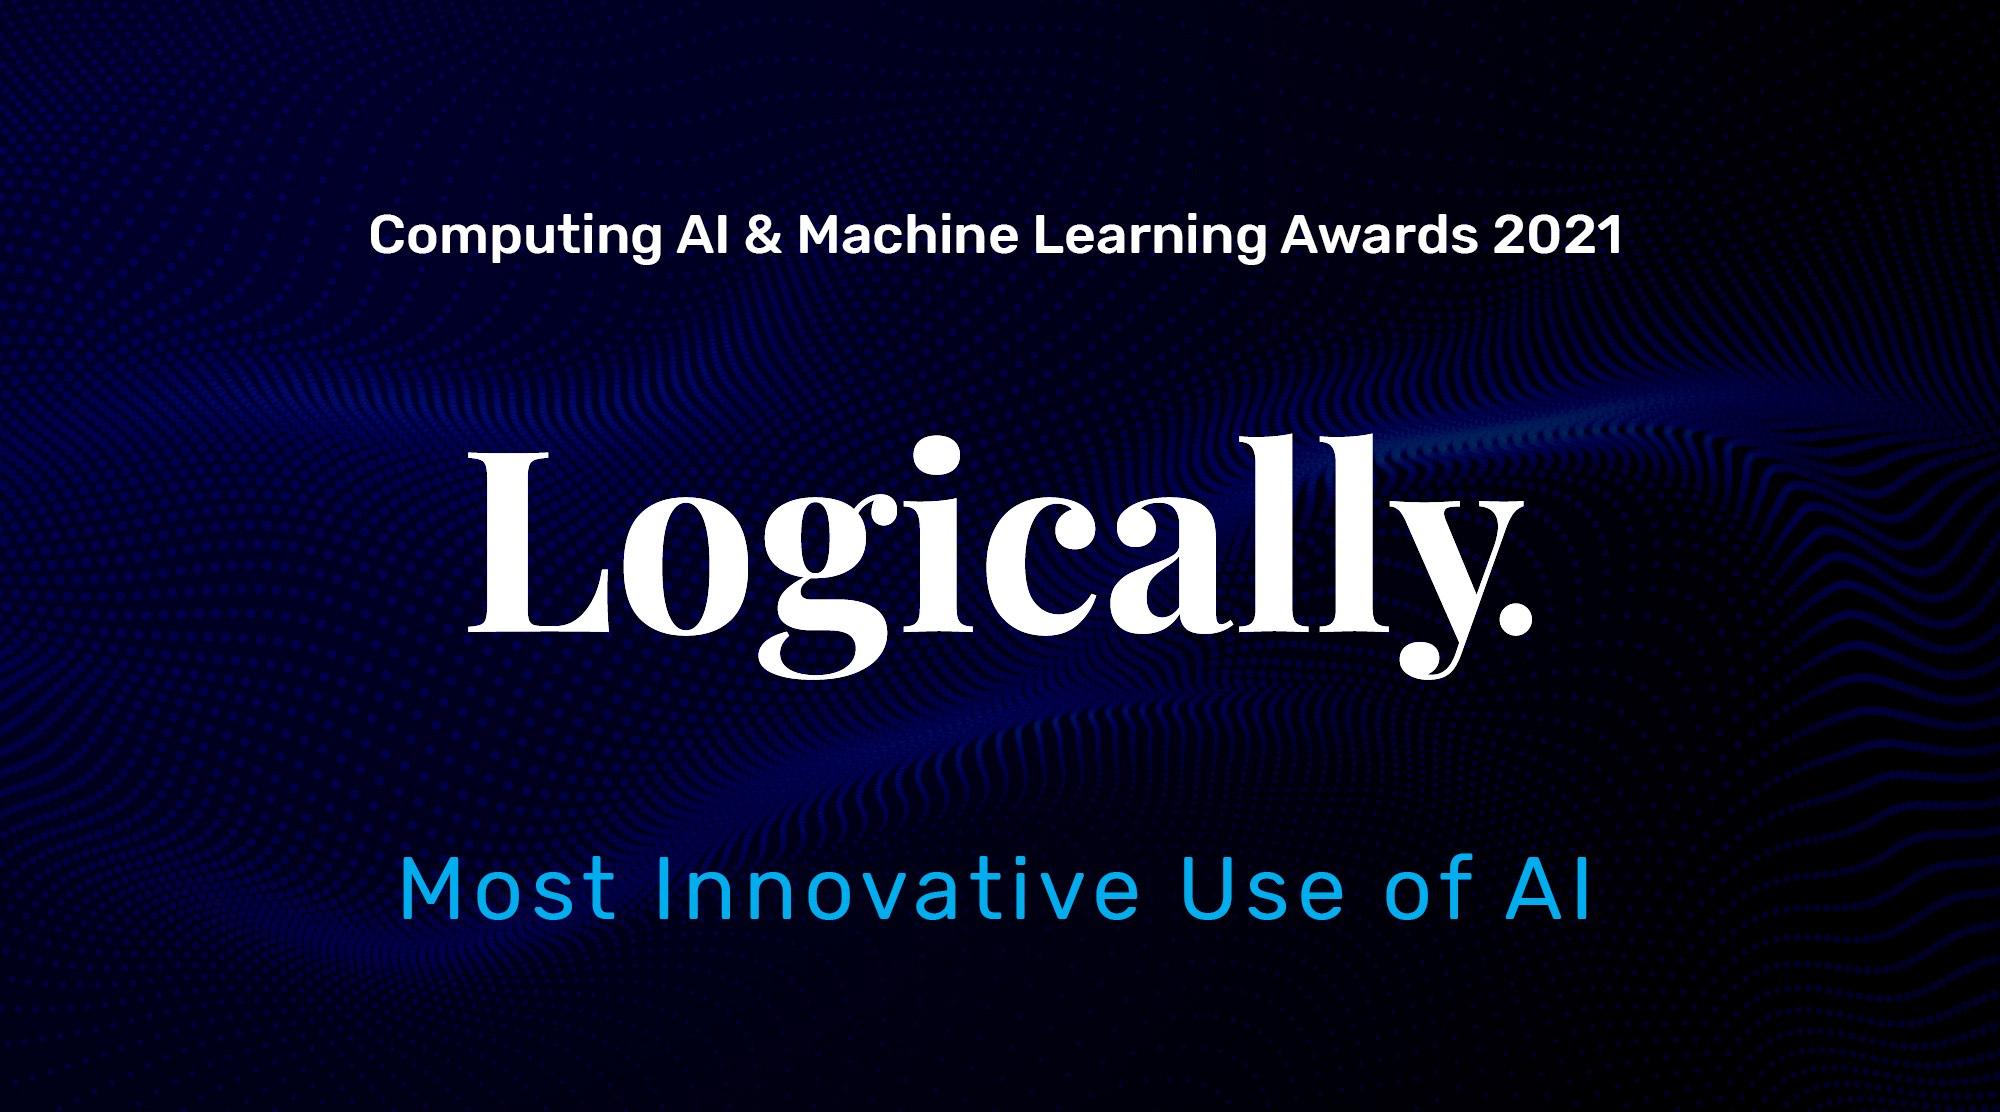 Logically wins the Most Innovative Use of AI award